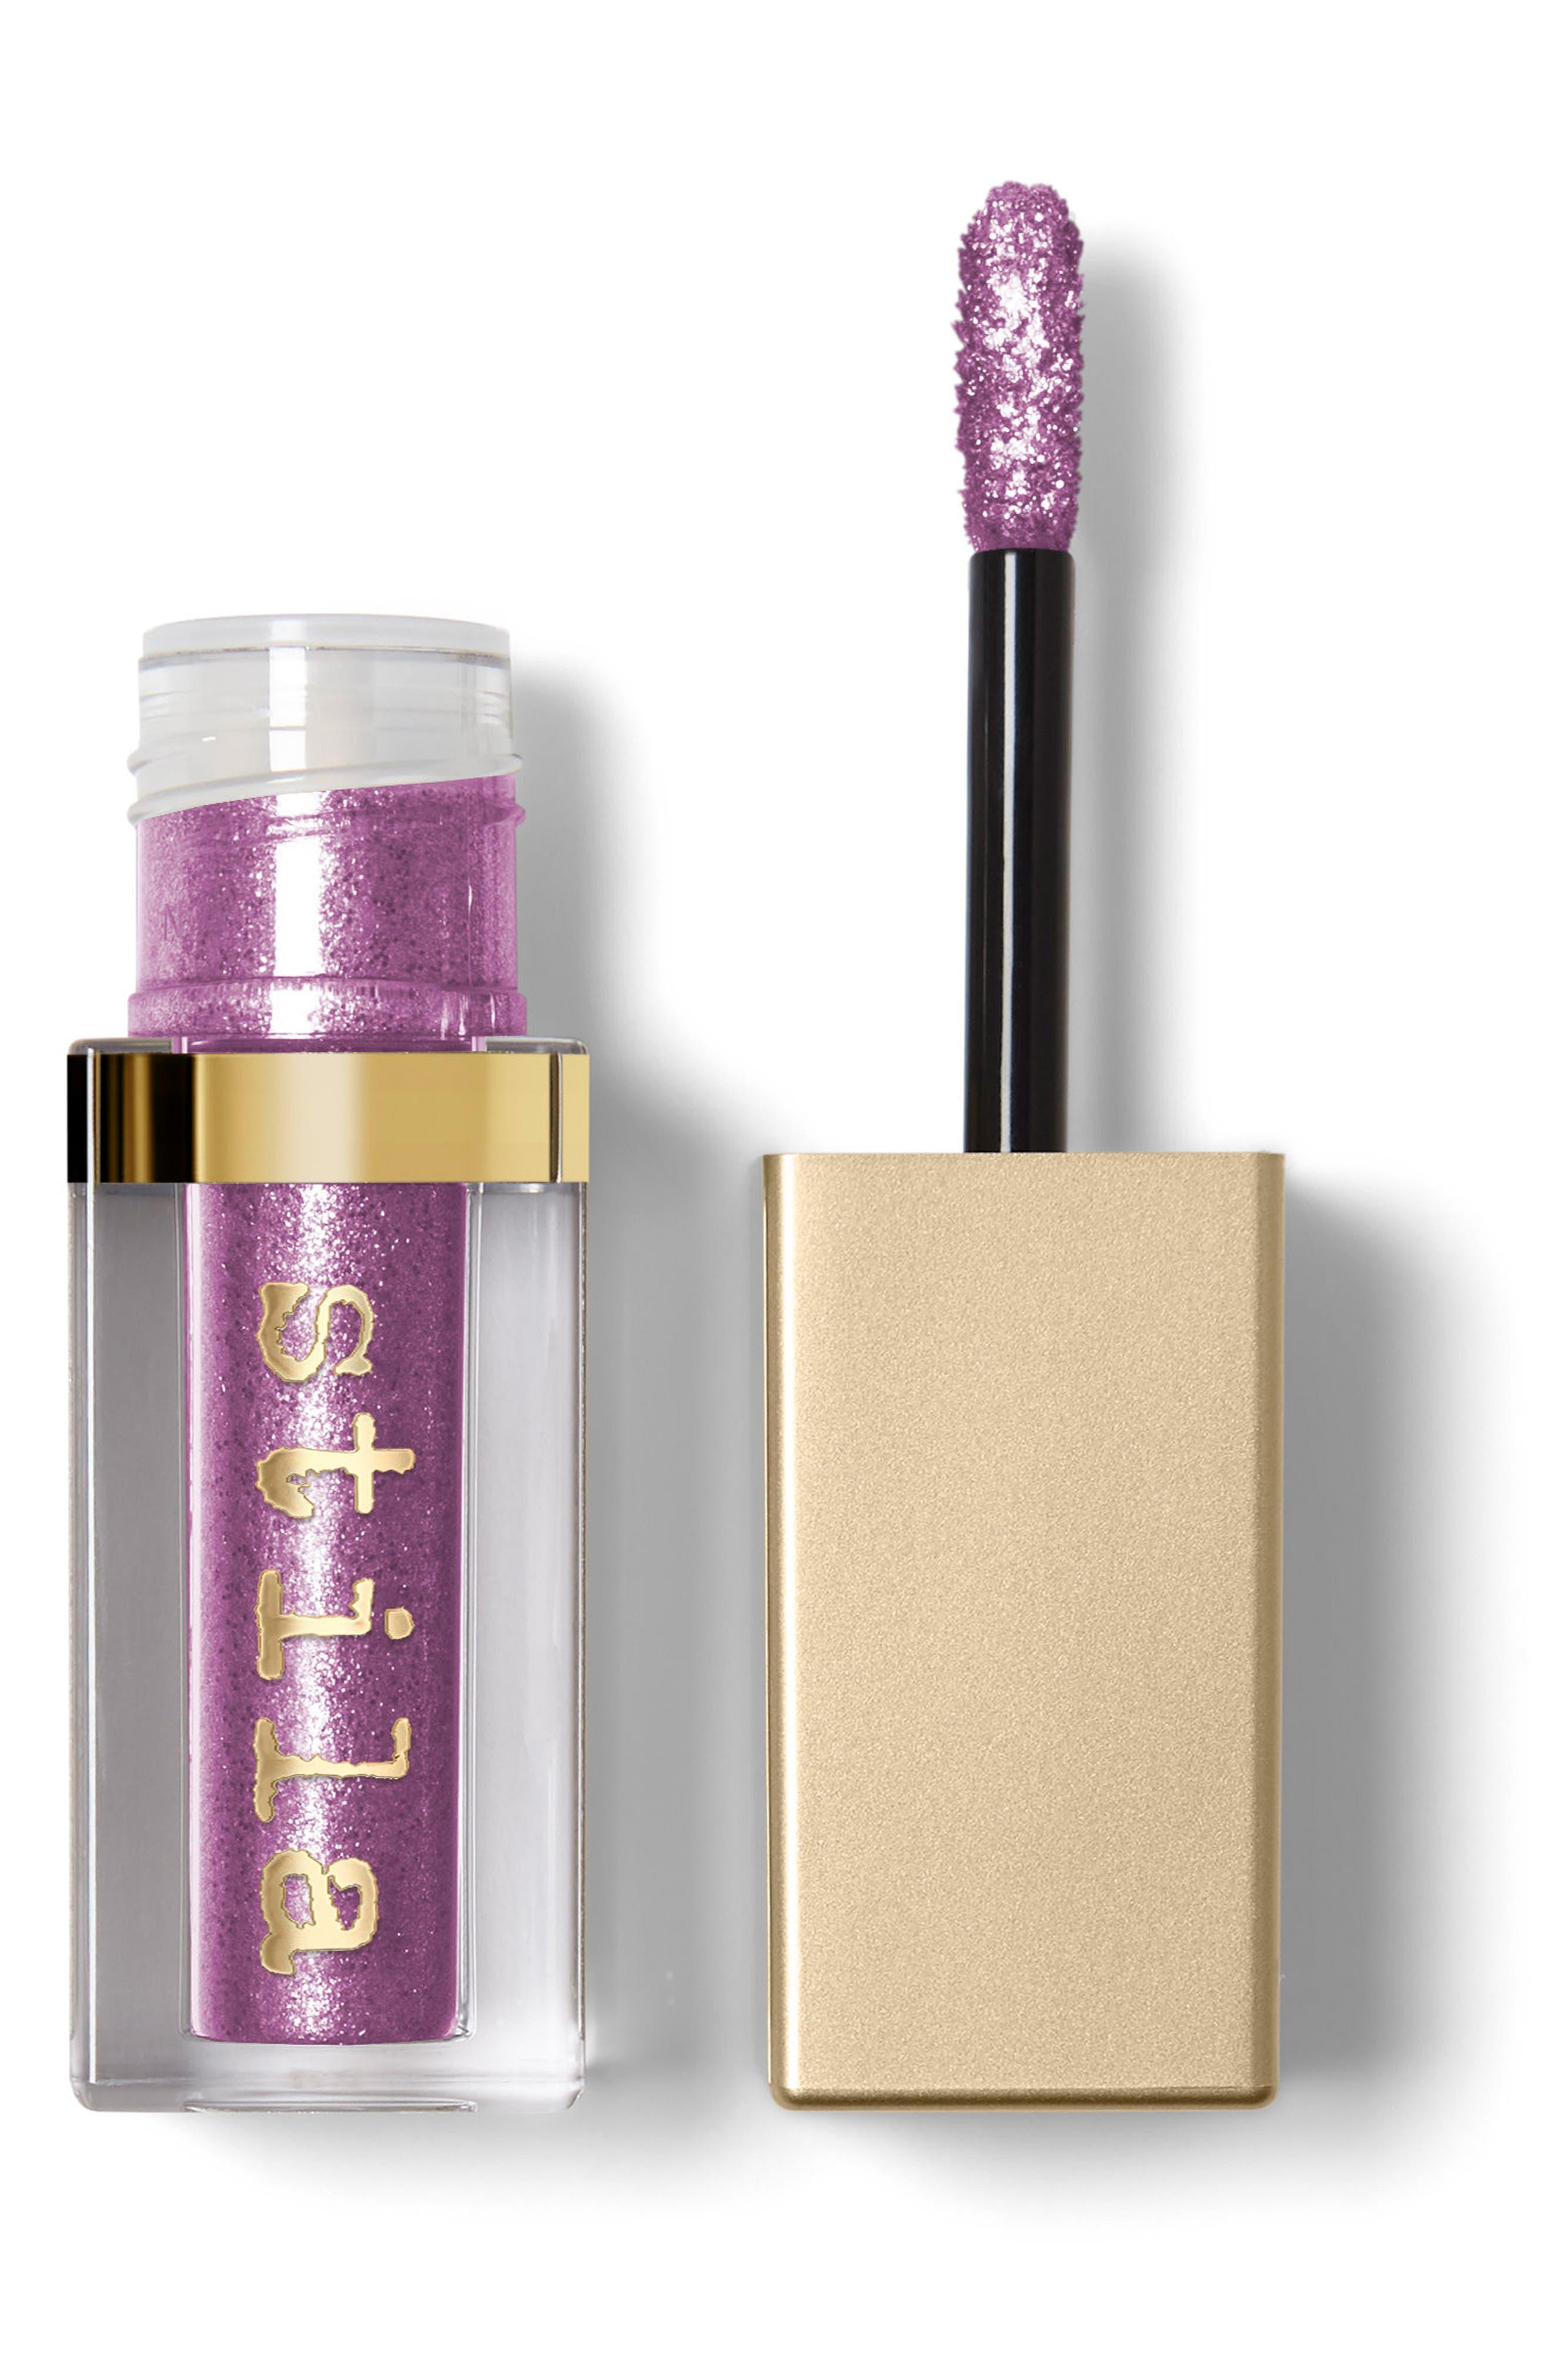 Main Image - Stila Magnificent Metals Glitter & Glow Liquid Eyeshadow